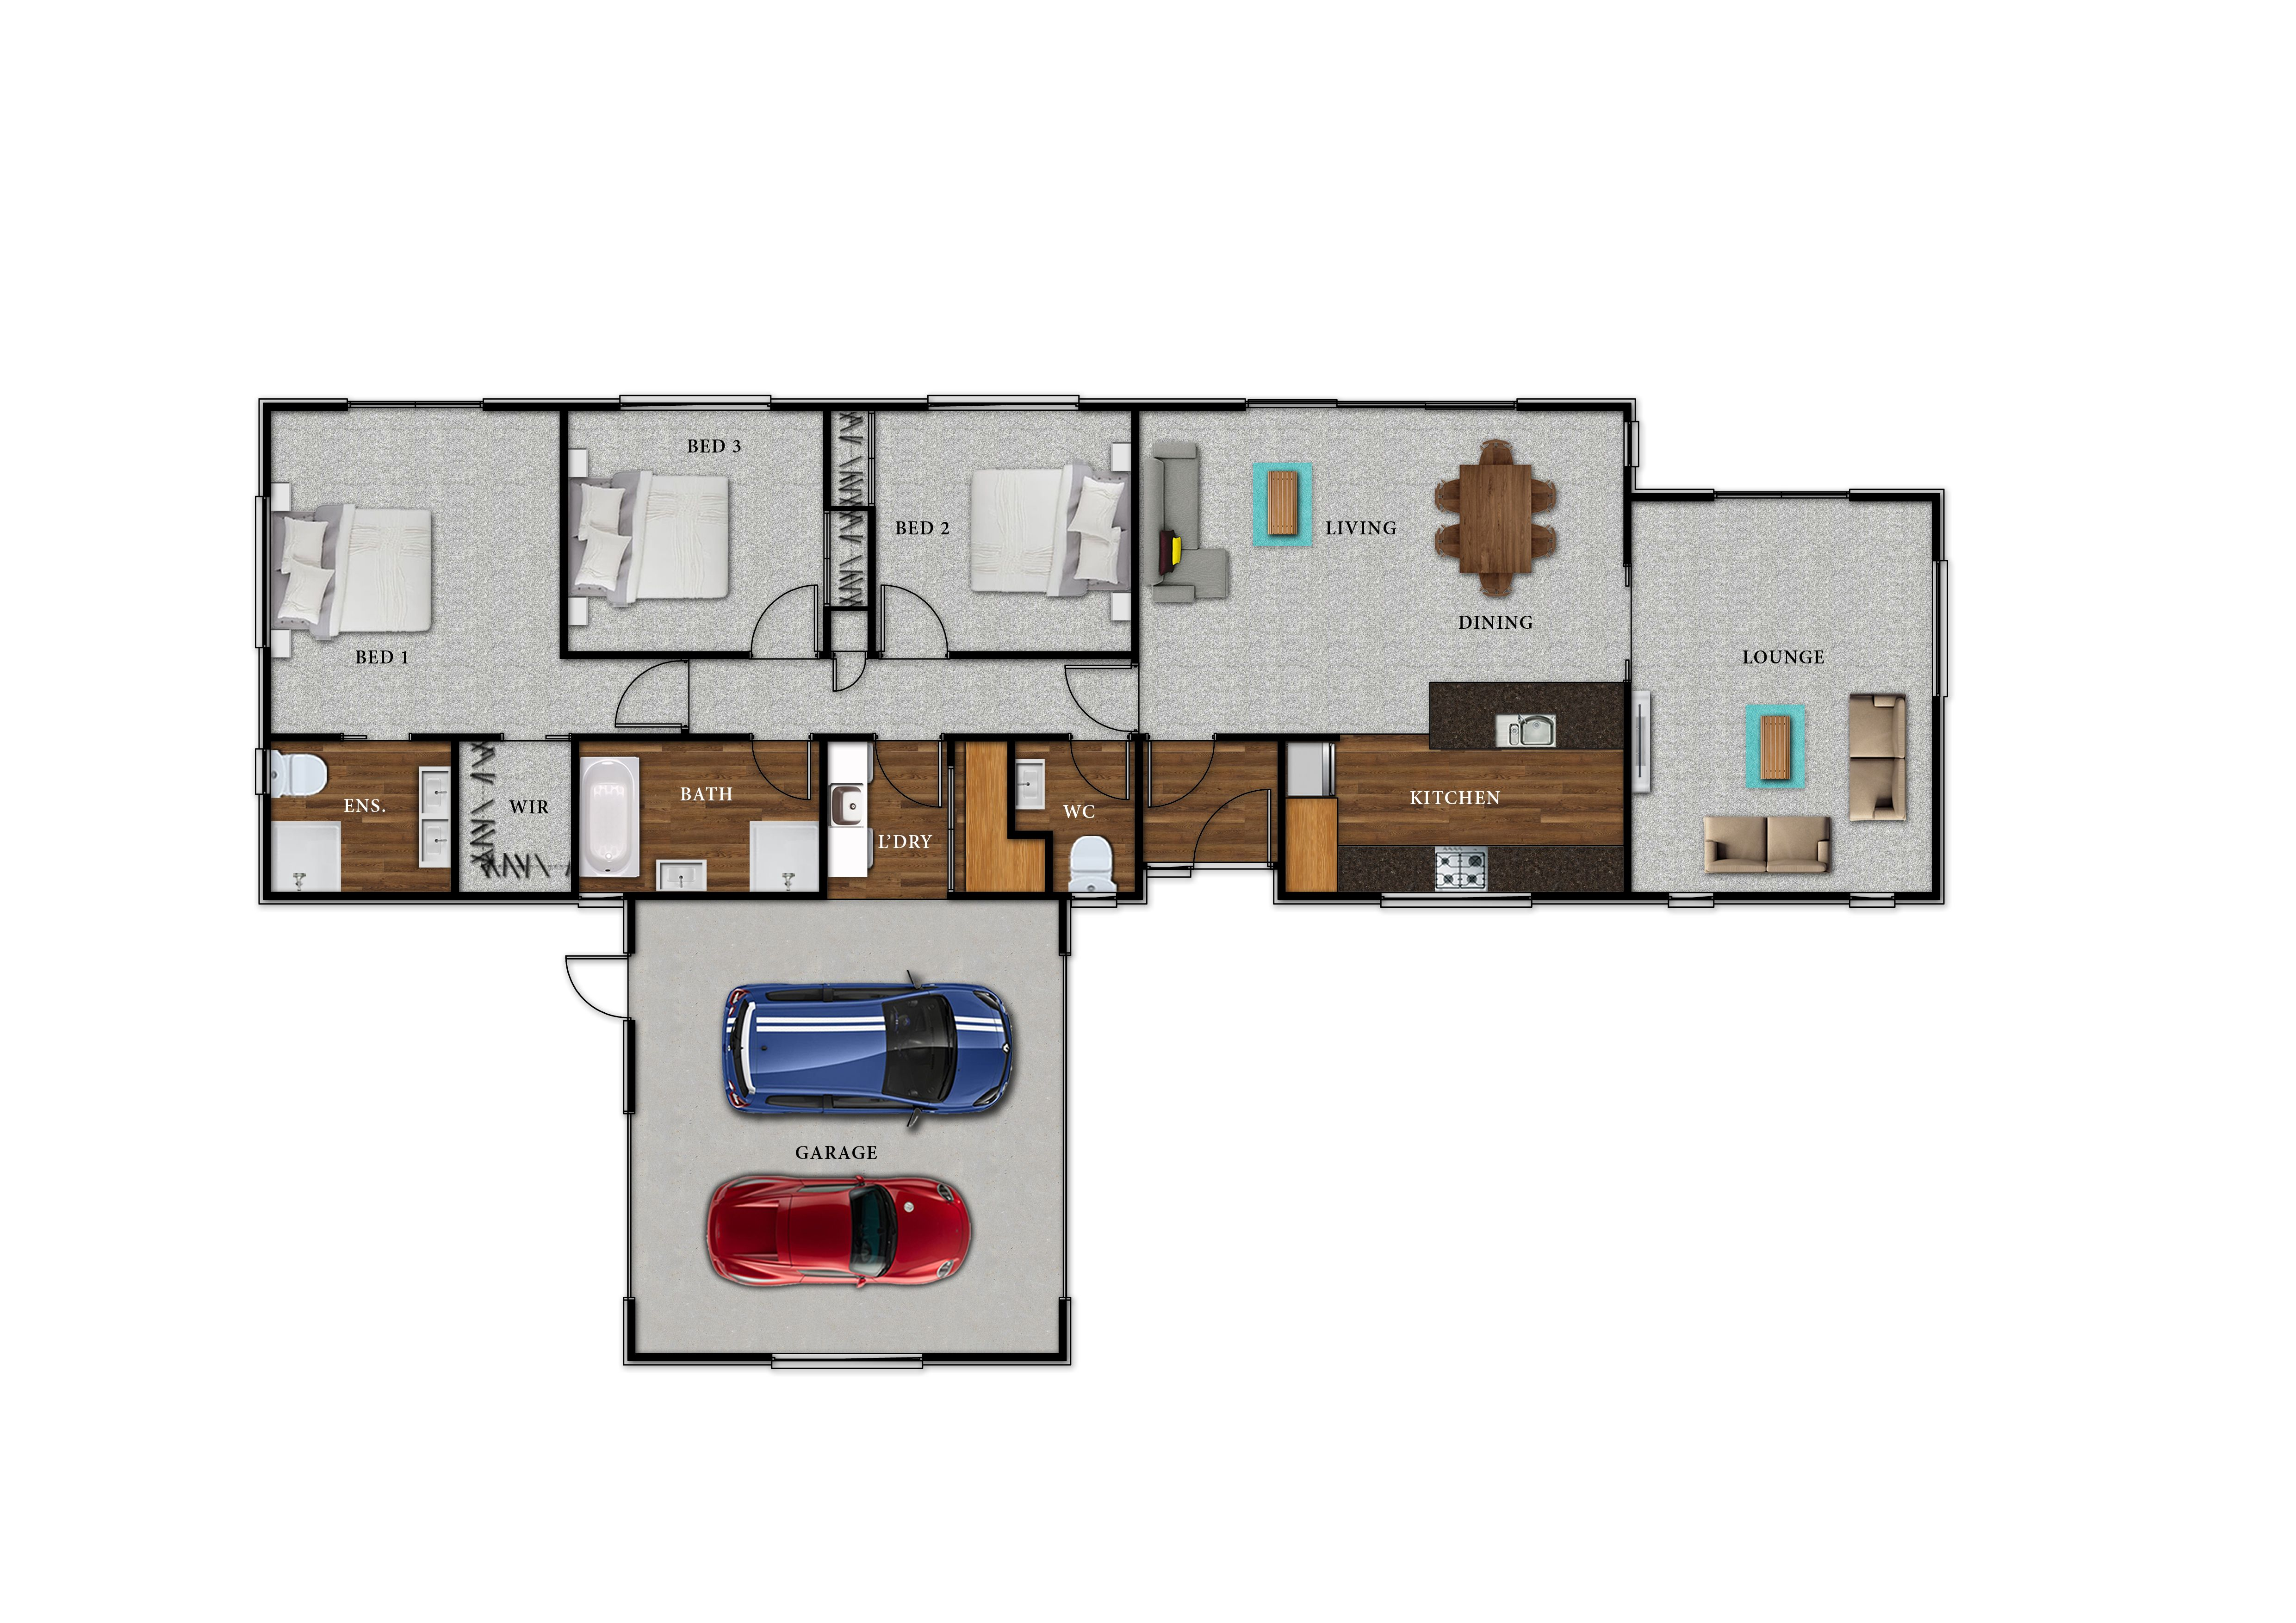 Lot 104 Kingsbridge West - Floor Plan